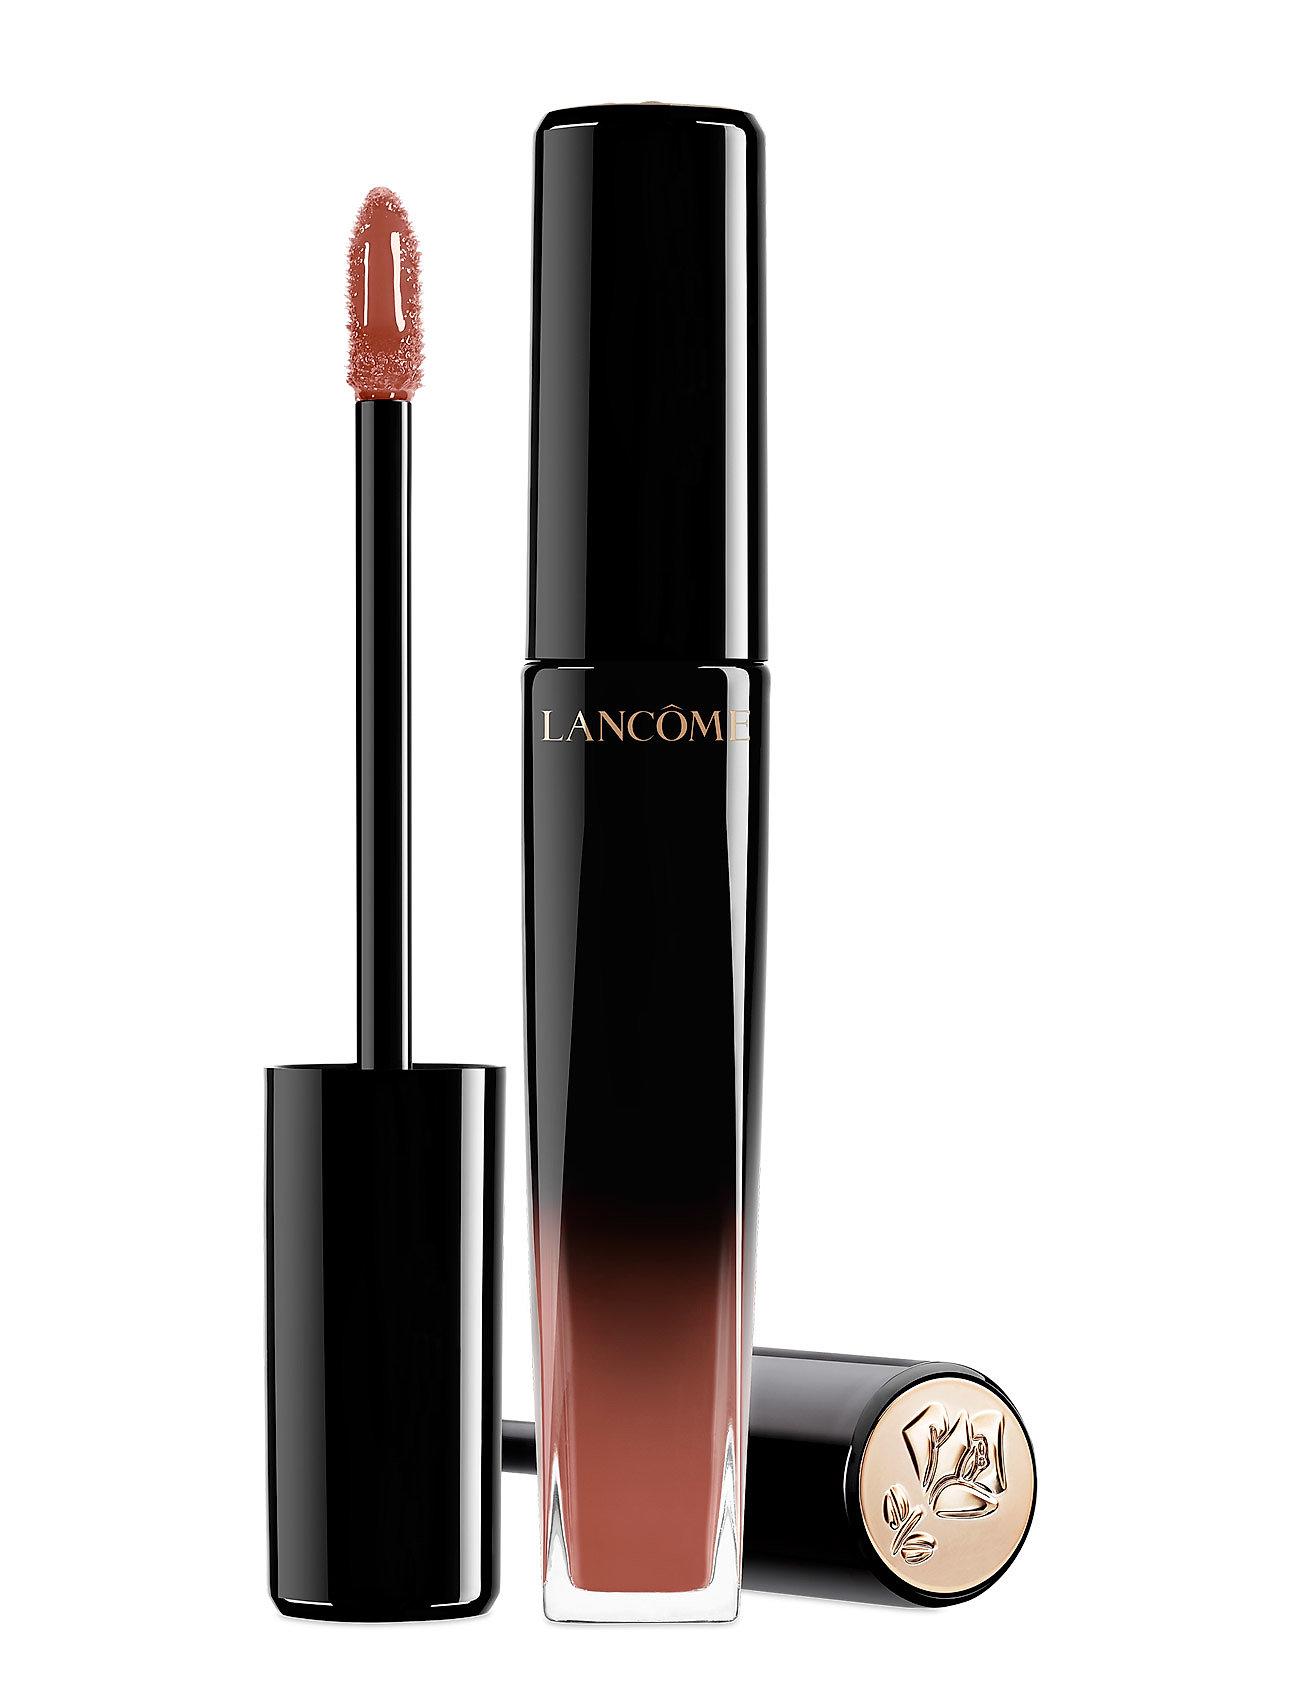 Image of L'Absolu Lacquer Beige Sensation 274 Lipgloss Makeup Beige Lancôme (3260819161)